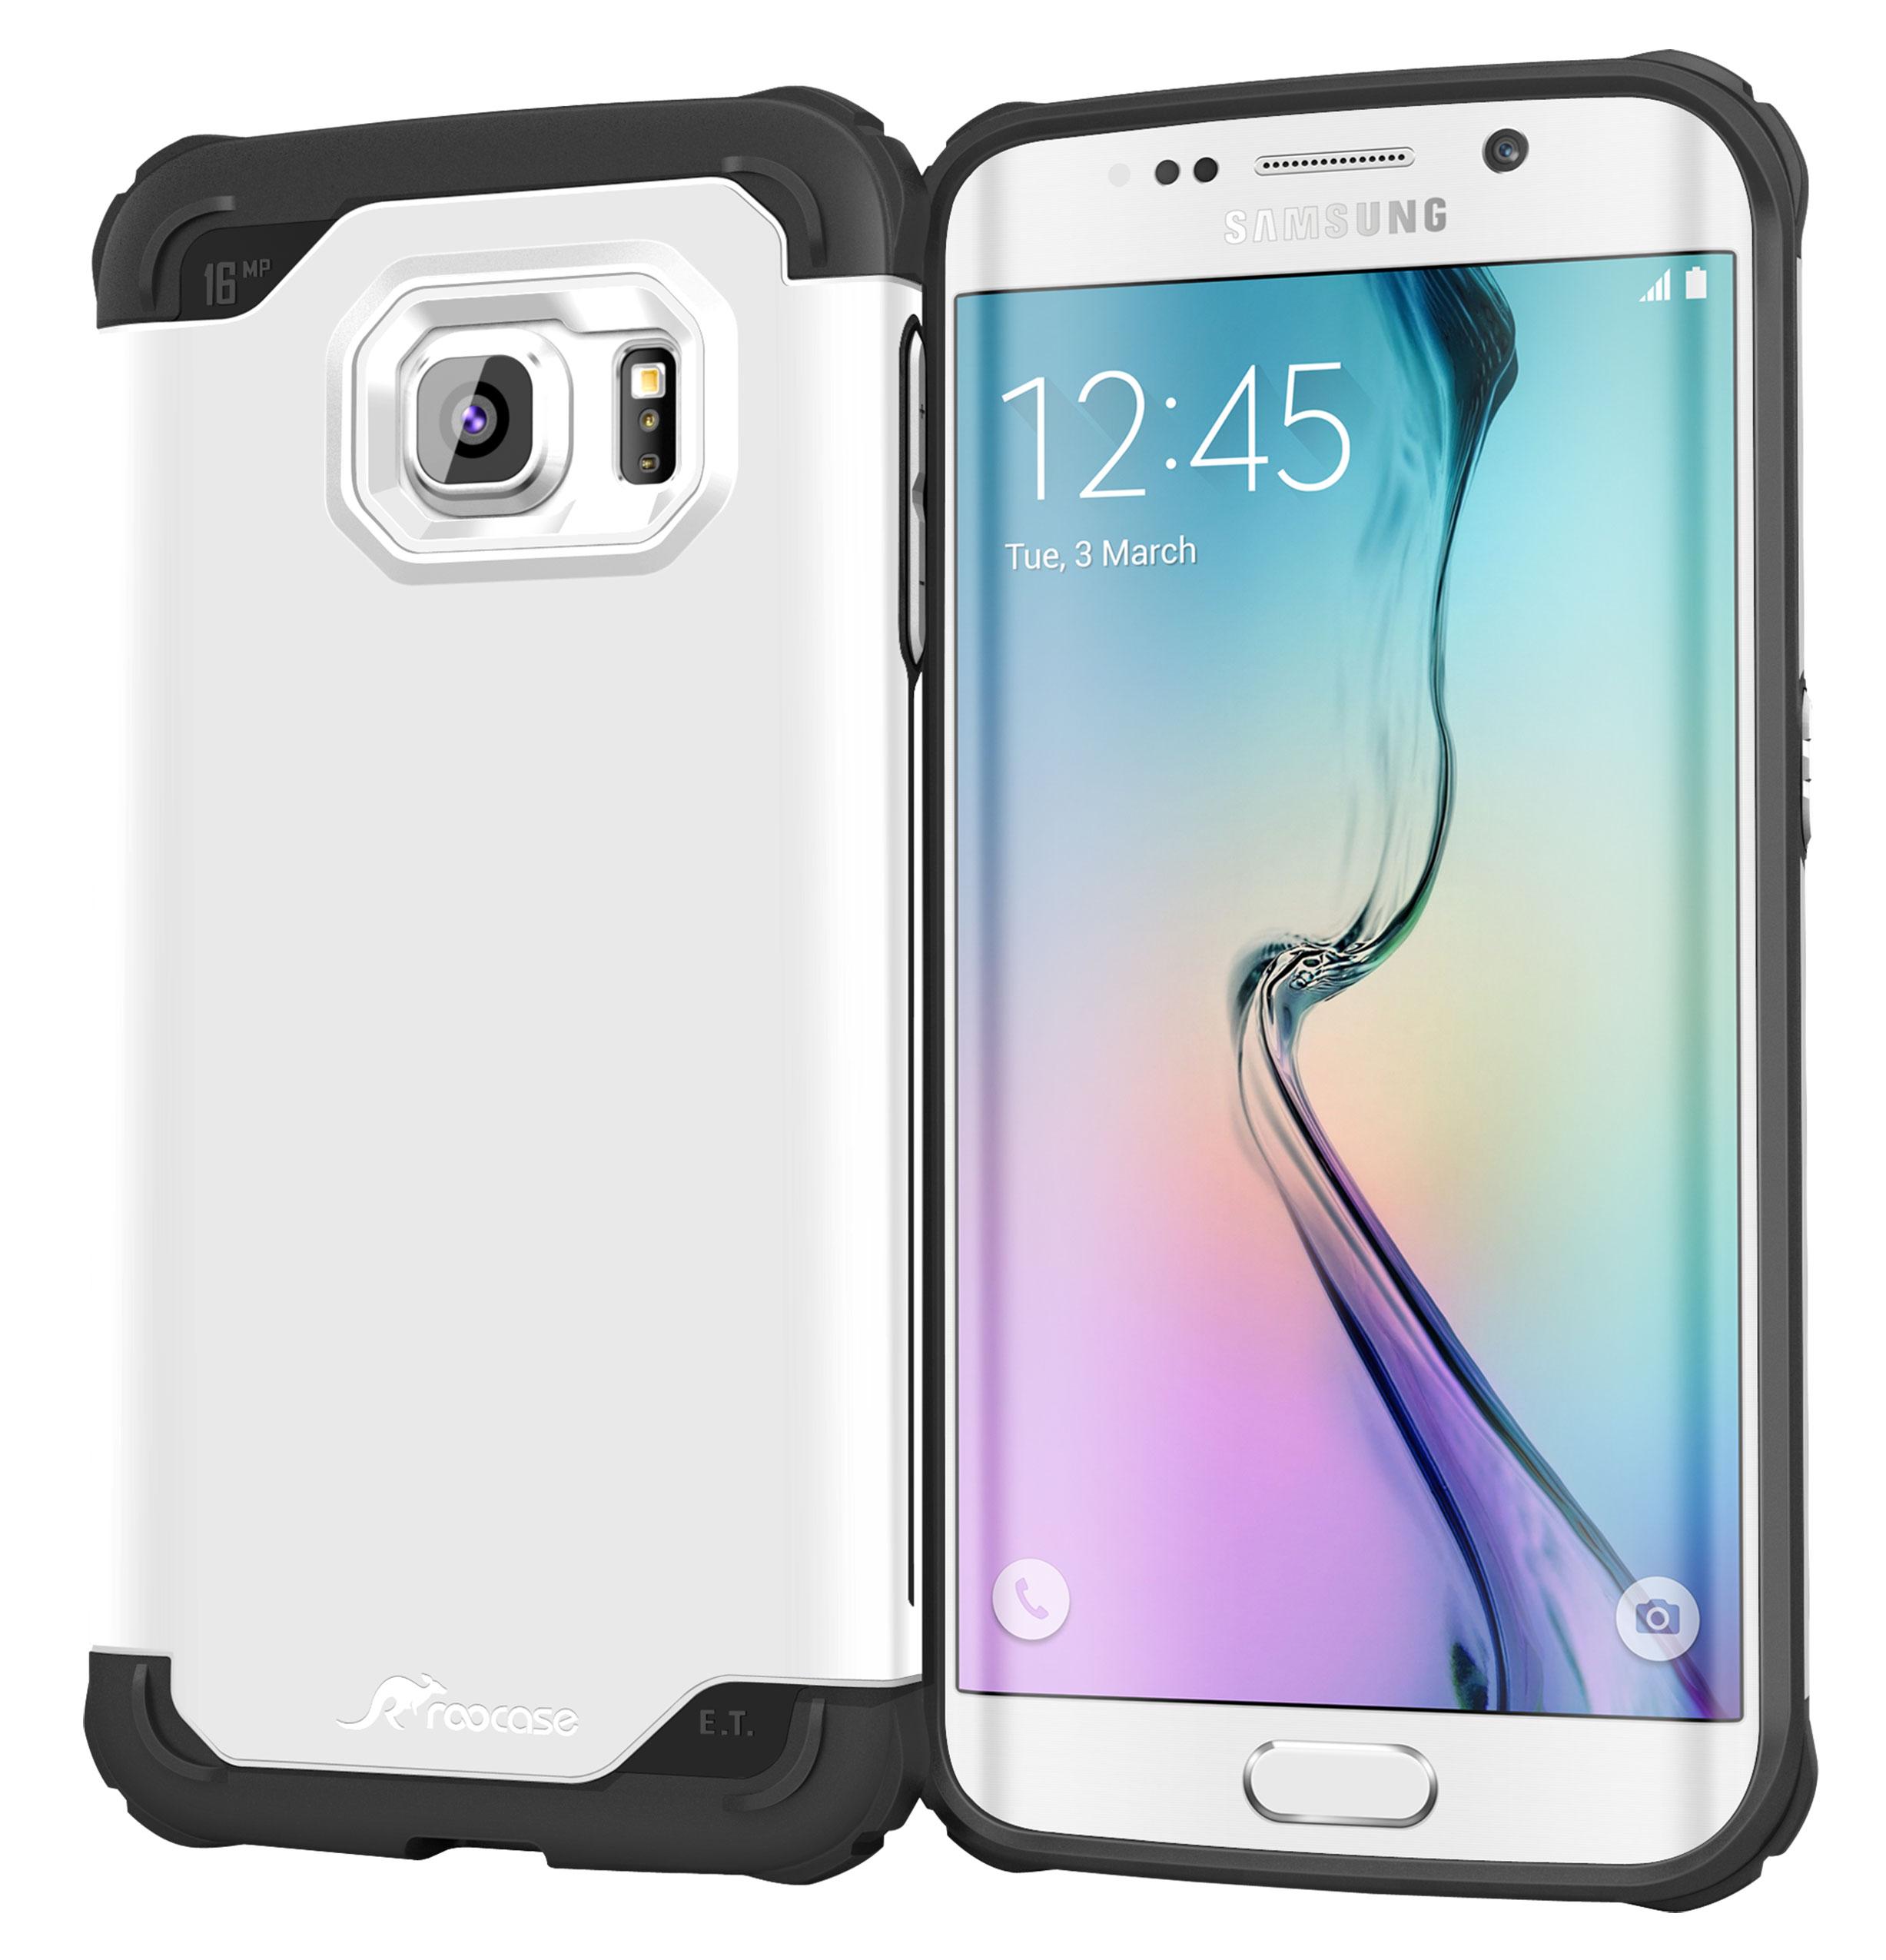 Galaxy S6 Edge Case, roocase [Exec Tough] Galaxy S6 Edge Slim Fit Case Hybrid PC / TPU [Corner Protection] Armor Cover Case for Samsung Galaxy S6 Edge (2015)